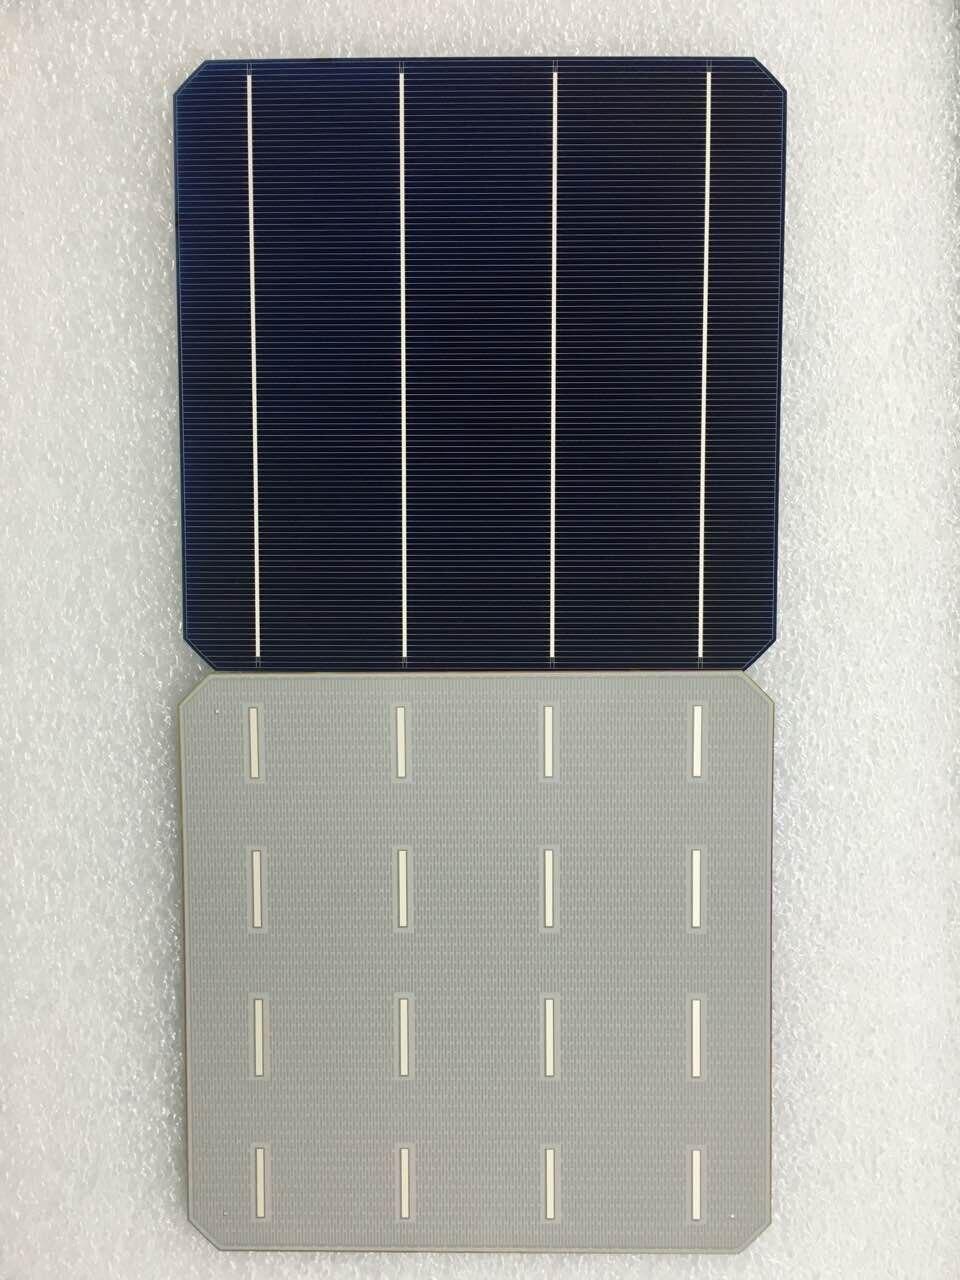 energia solar direct 2017 promotion 100pcs high efficiency mono solar cell for diy panel. Black Bedroom Furniture Sets. Home Design Ideas